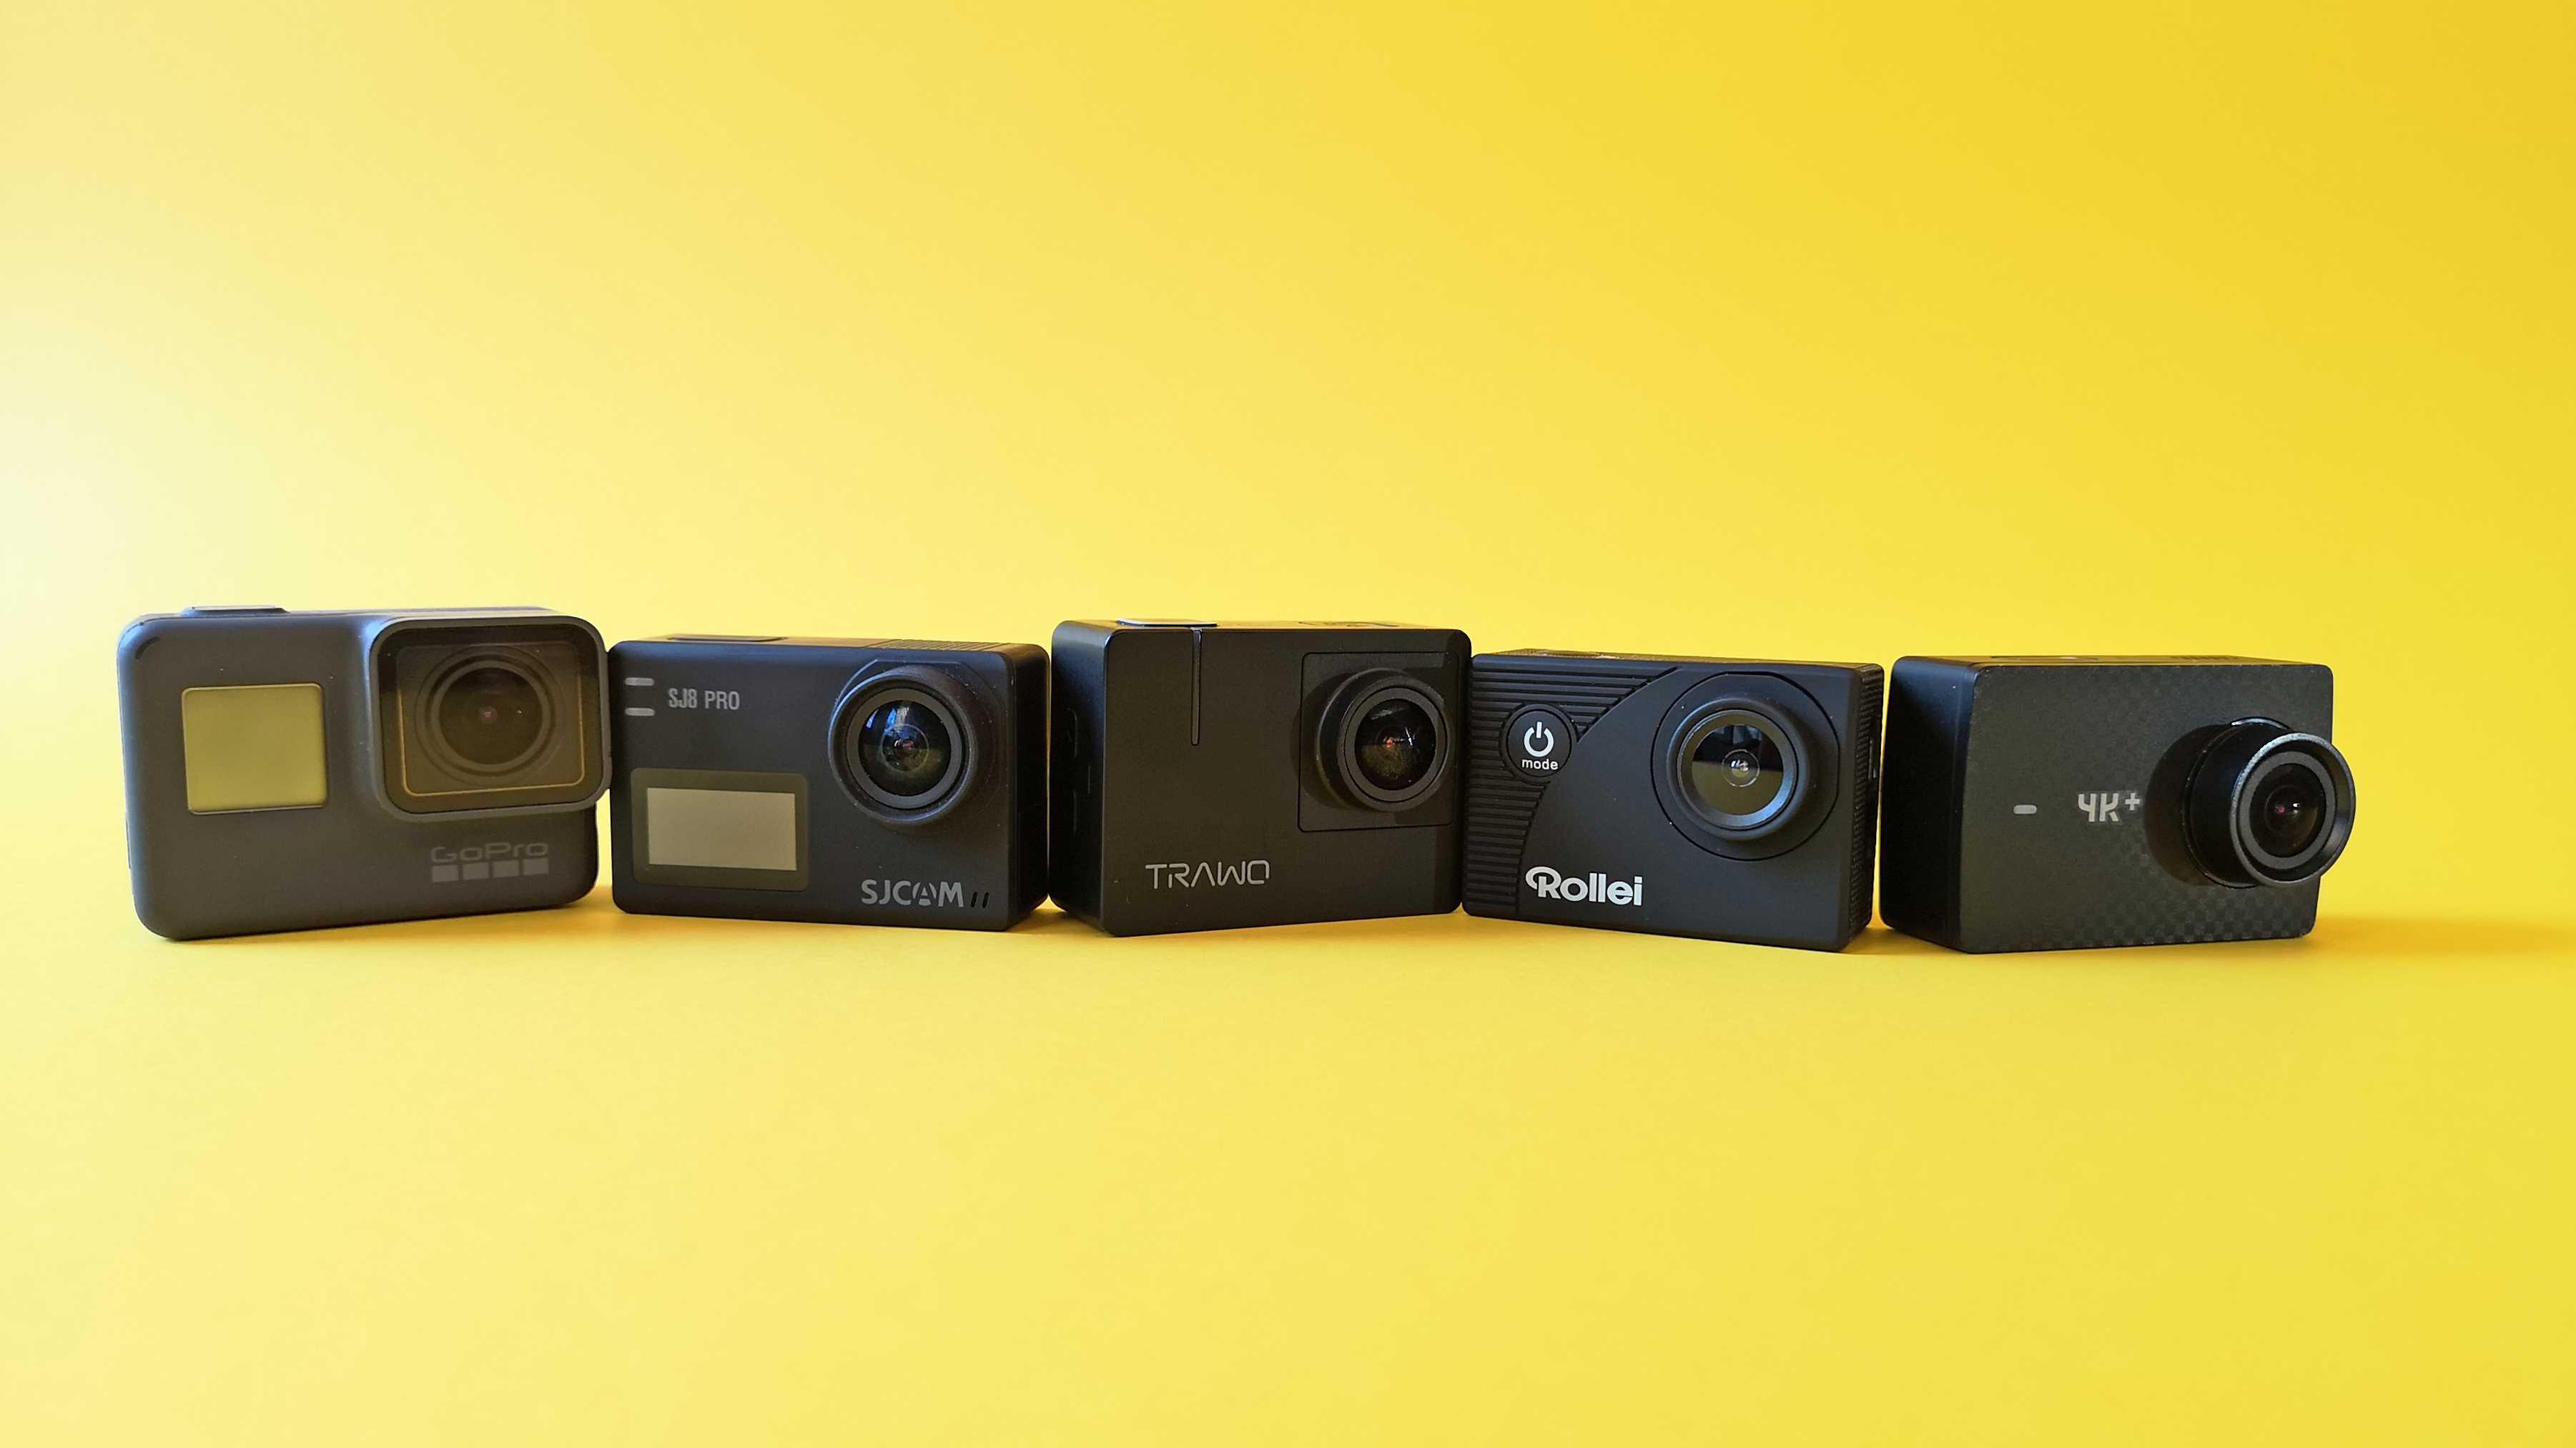 Kaufberatung 4K-Actioncams bis 200 Euro